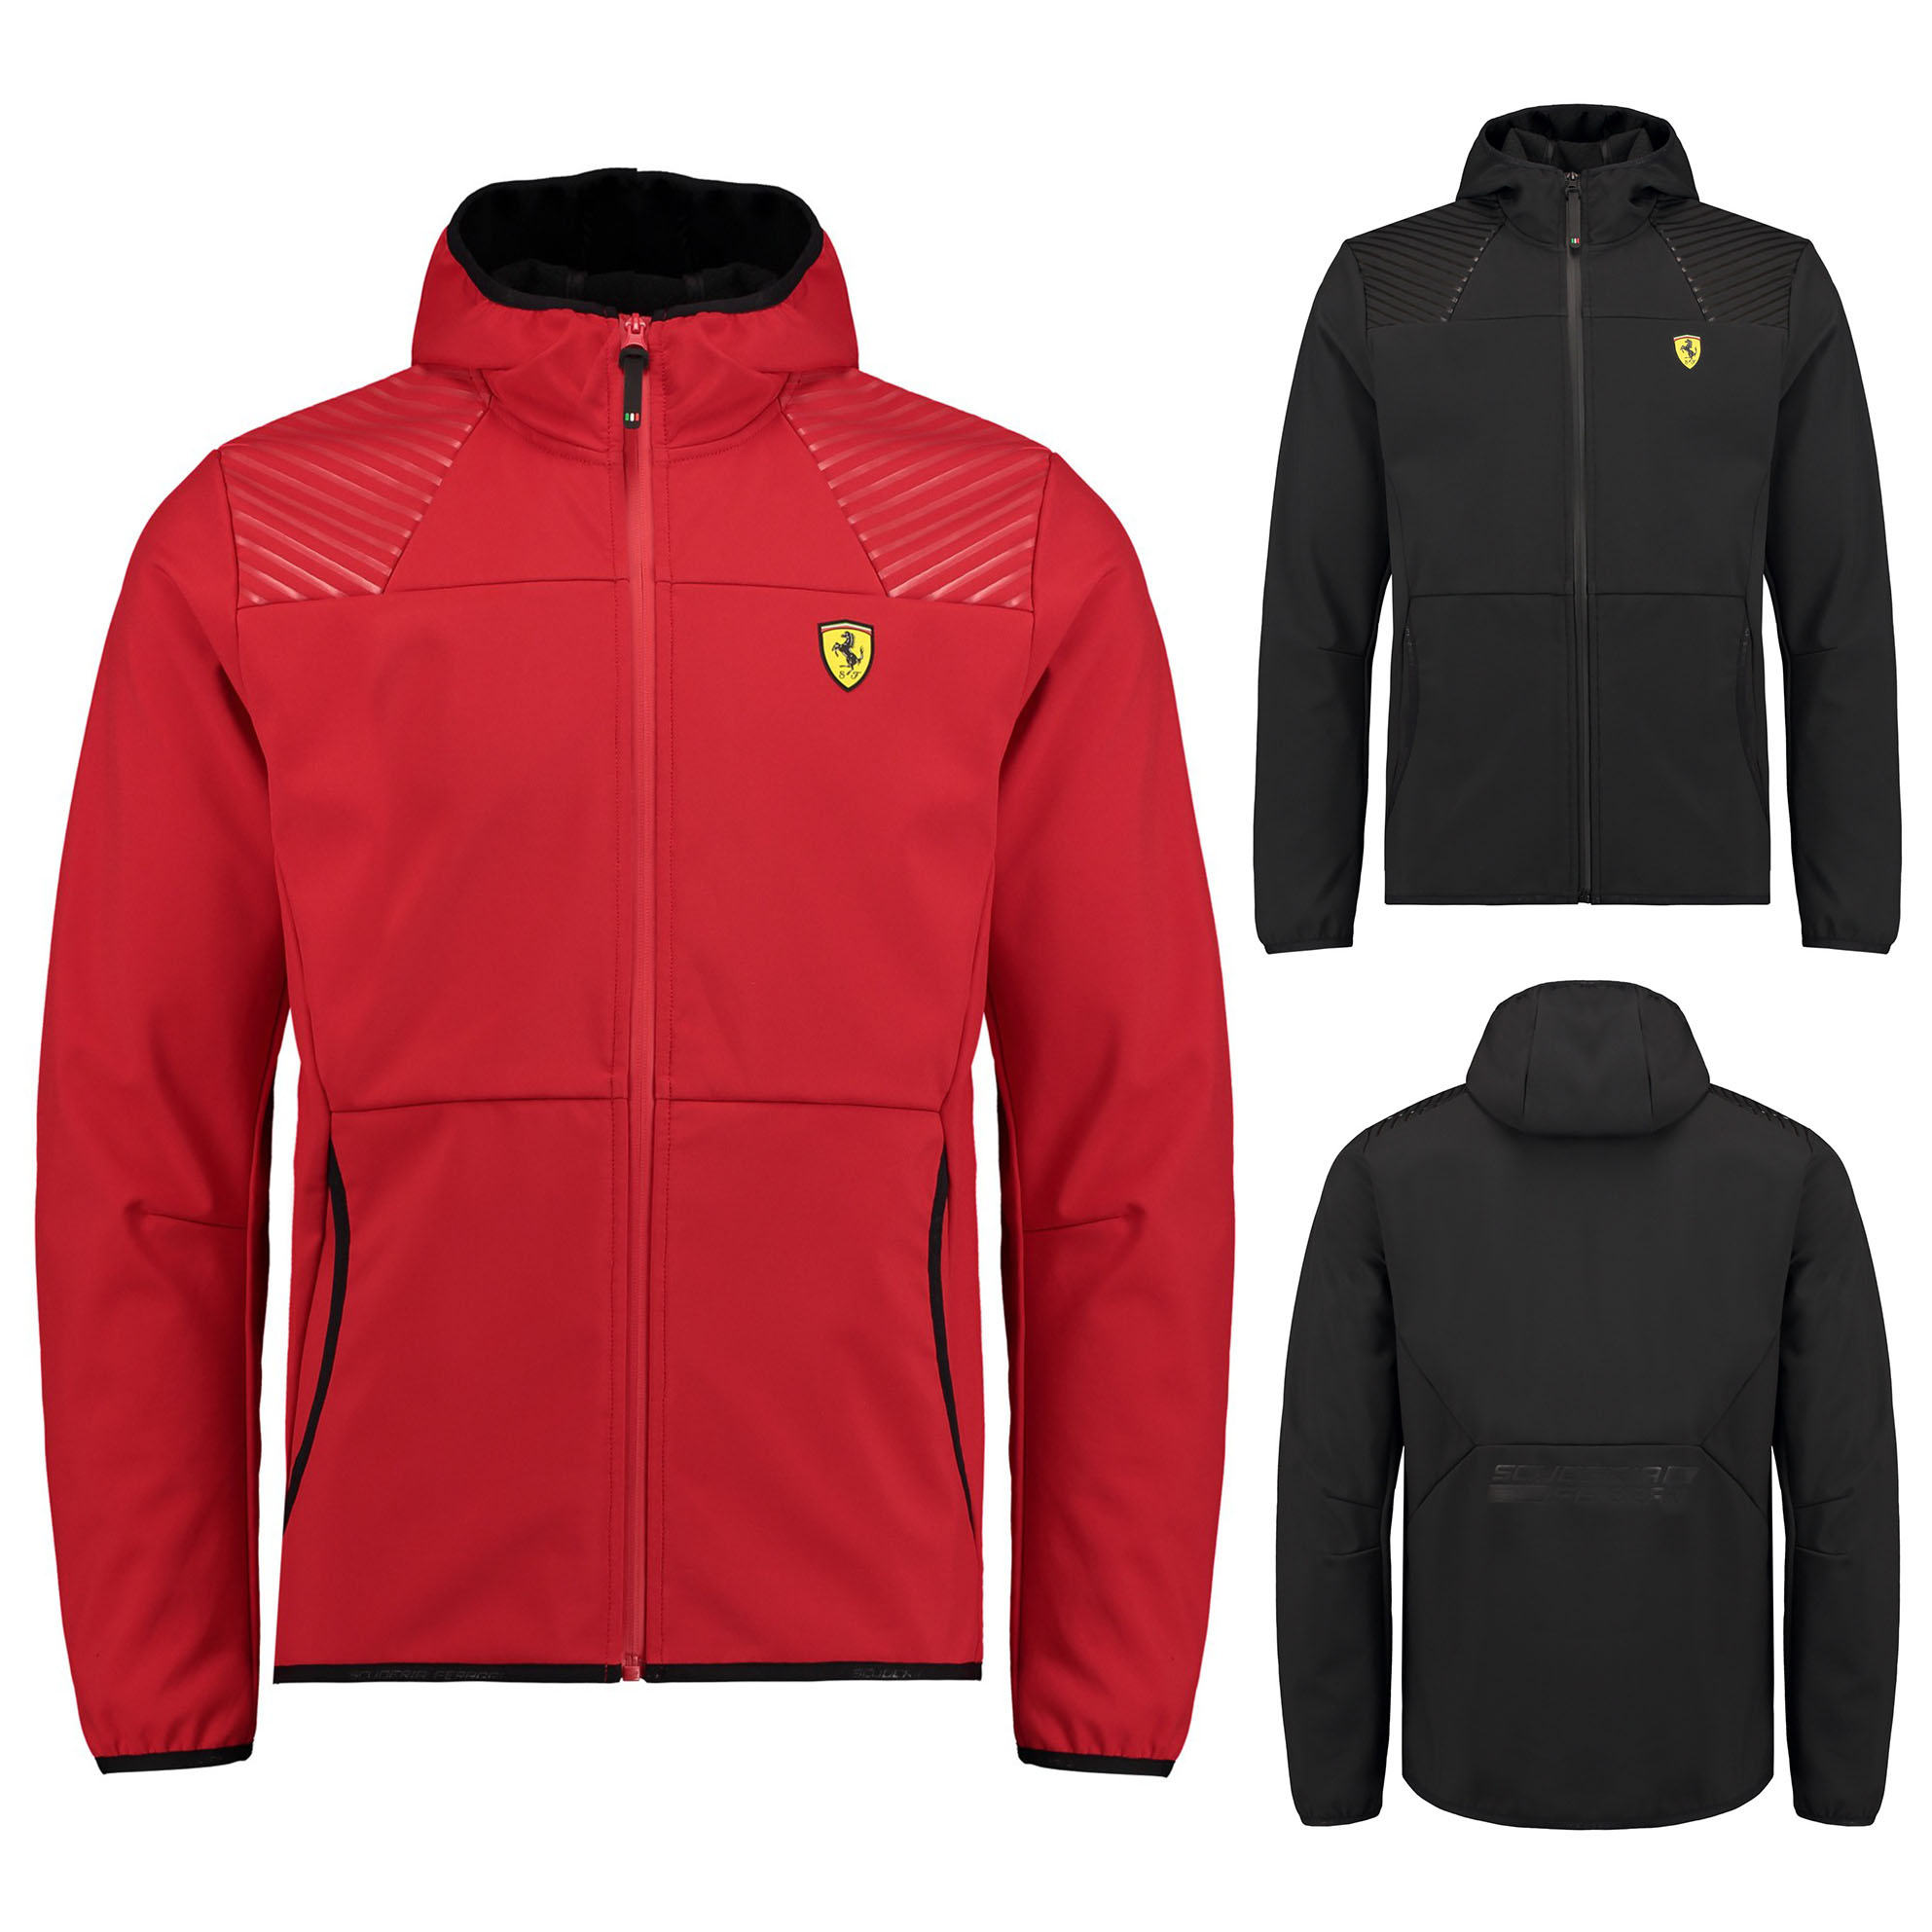 Details about 2018 Scuderia Ferrari Mens Soft Shell Fleece Jacket Zip Up Coat Sizes XS XXL